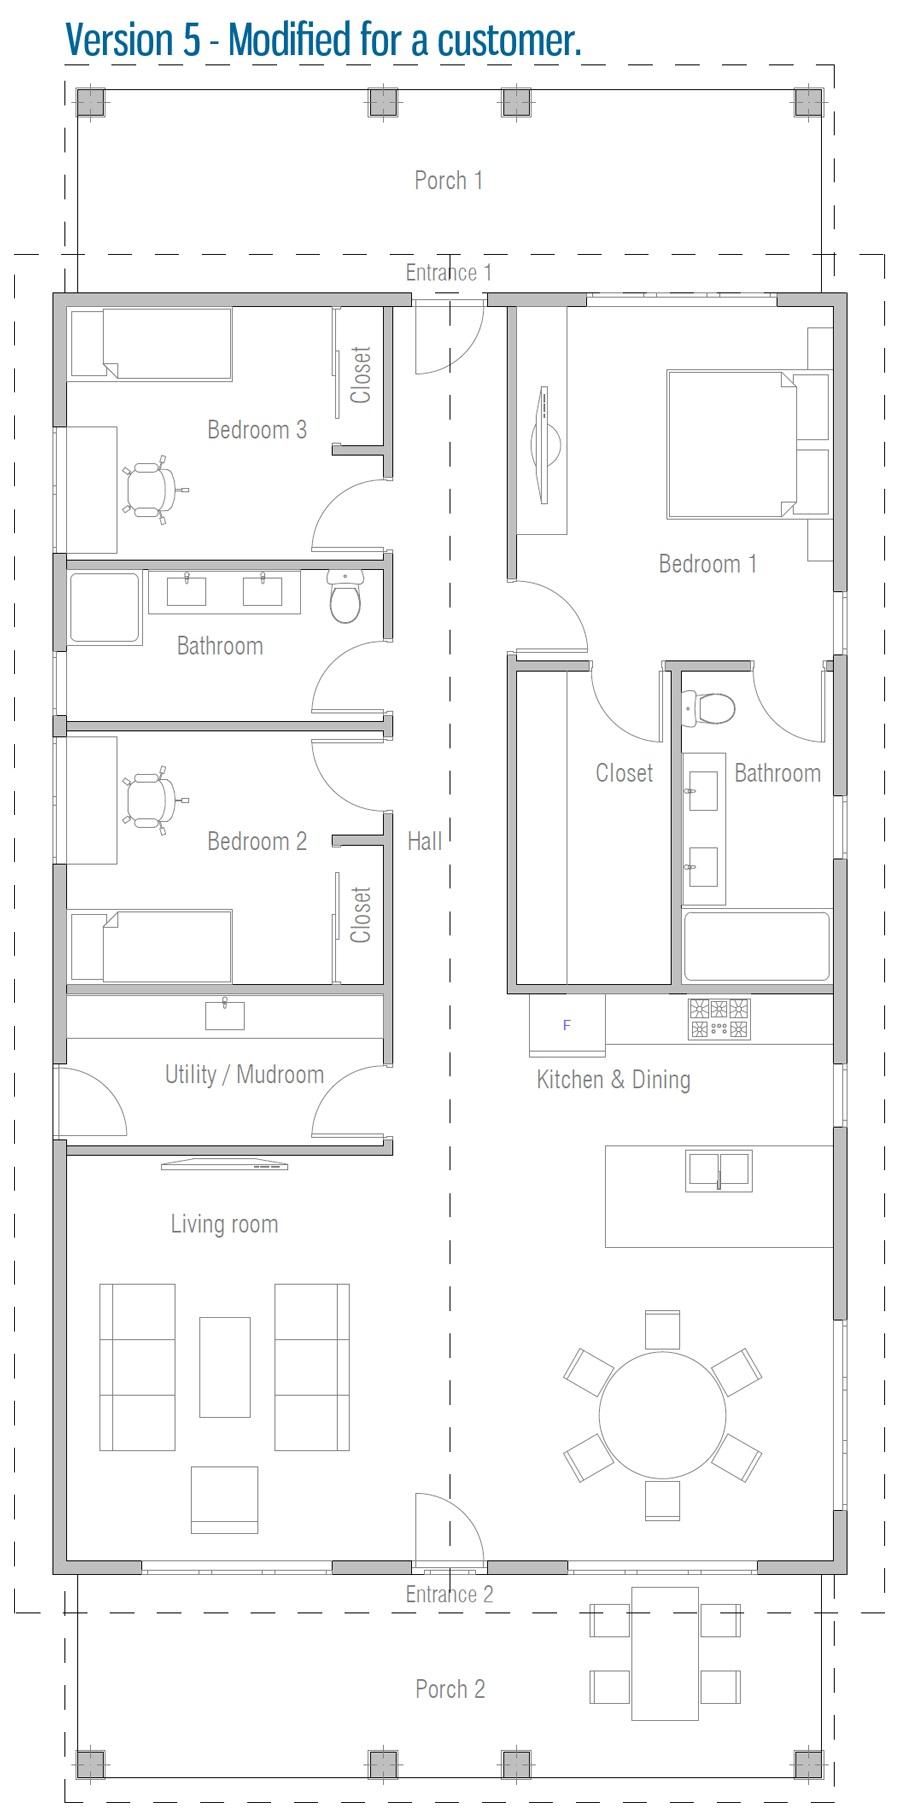 house-plans-2021_32_HOUSE_PLAN_CH671_V5.jpg